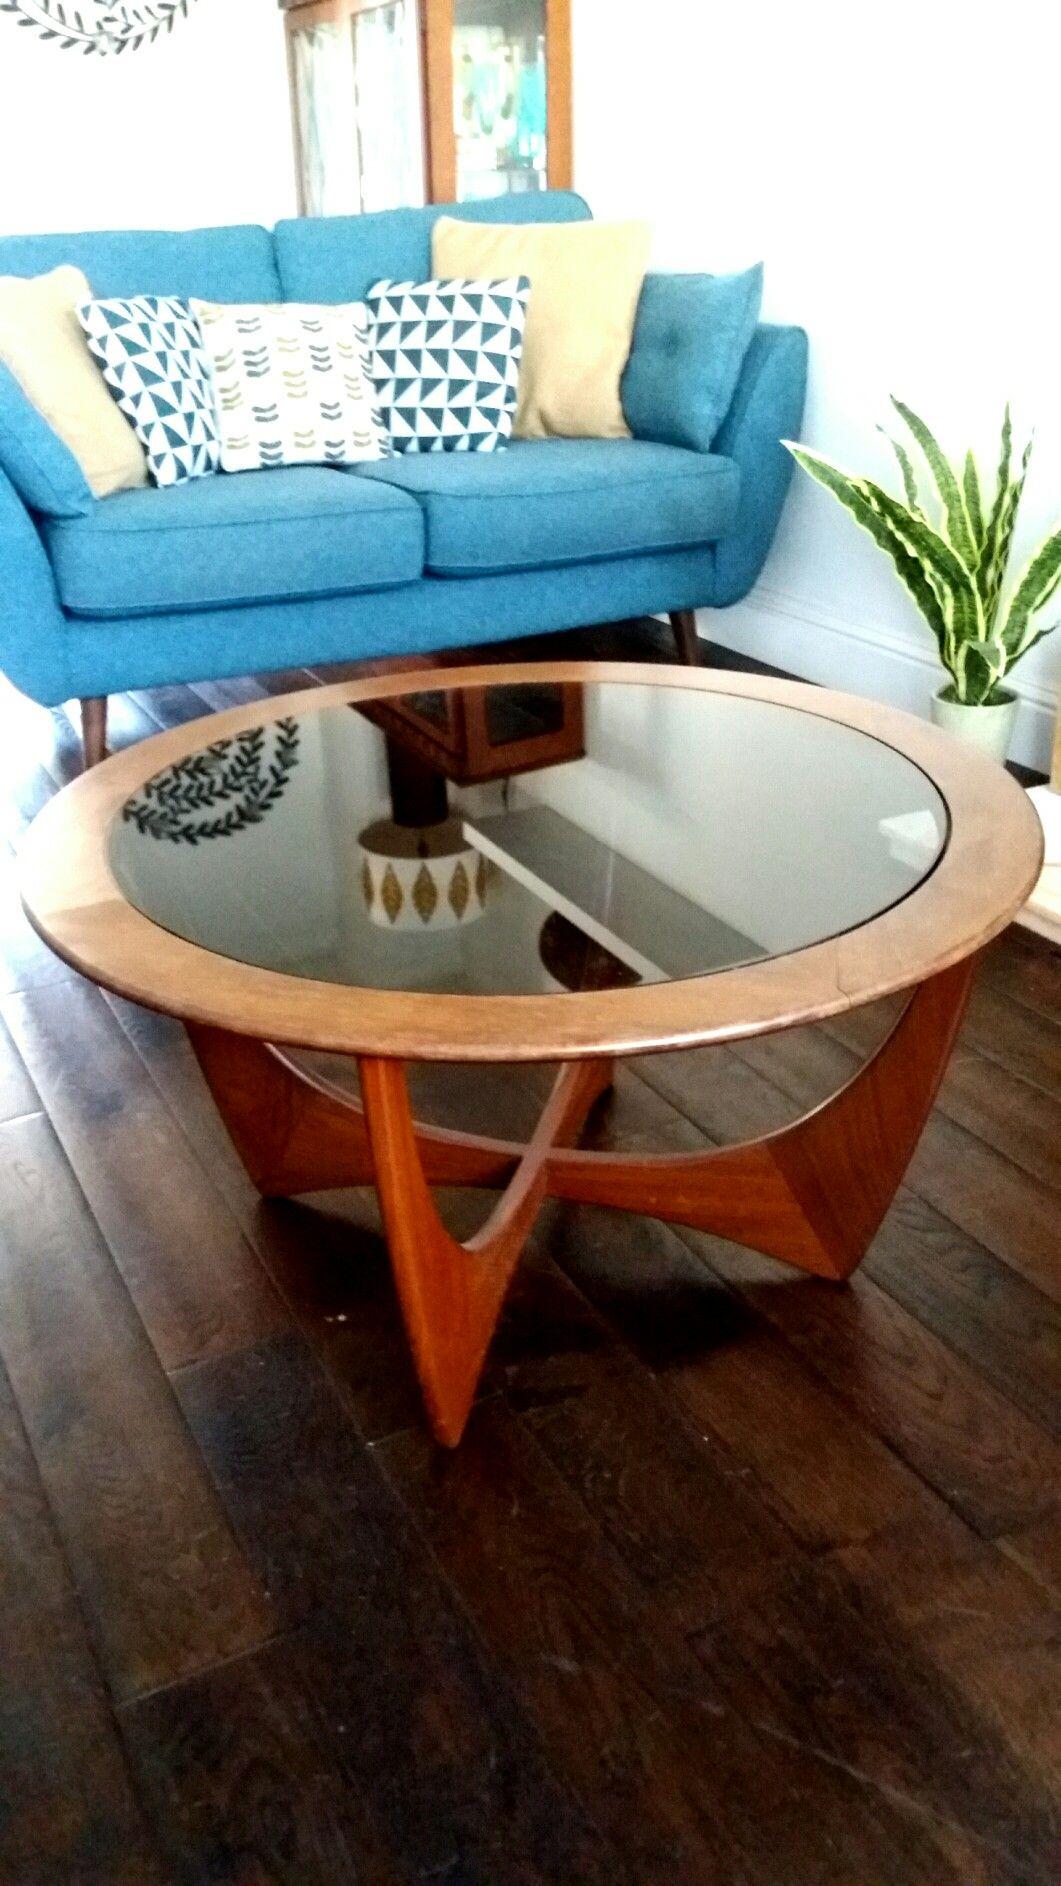 Teak furniture my happy place mid century interiors pinterest